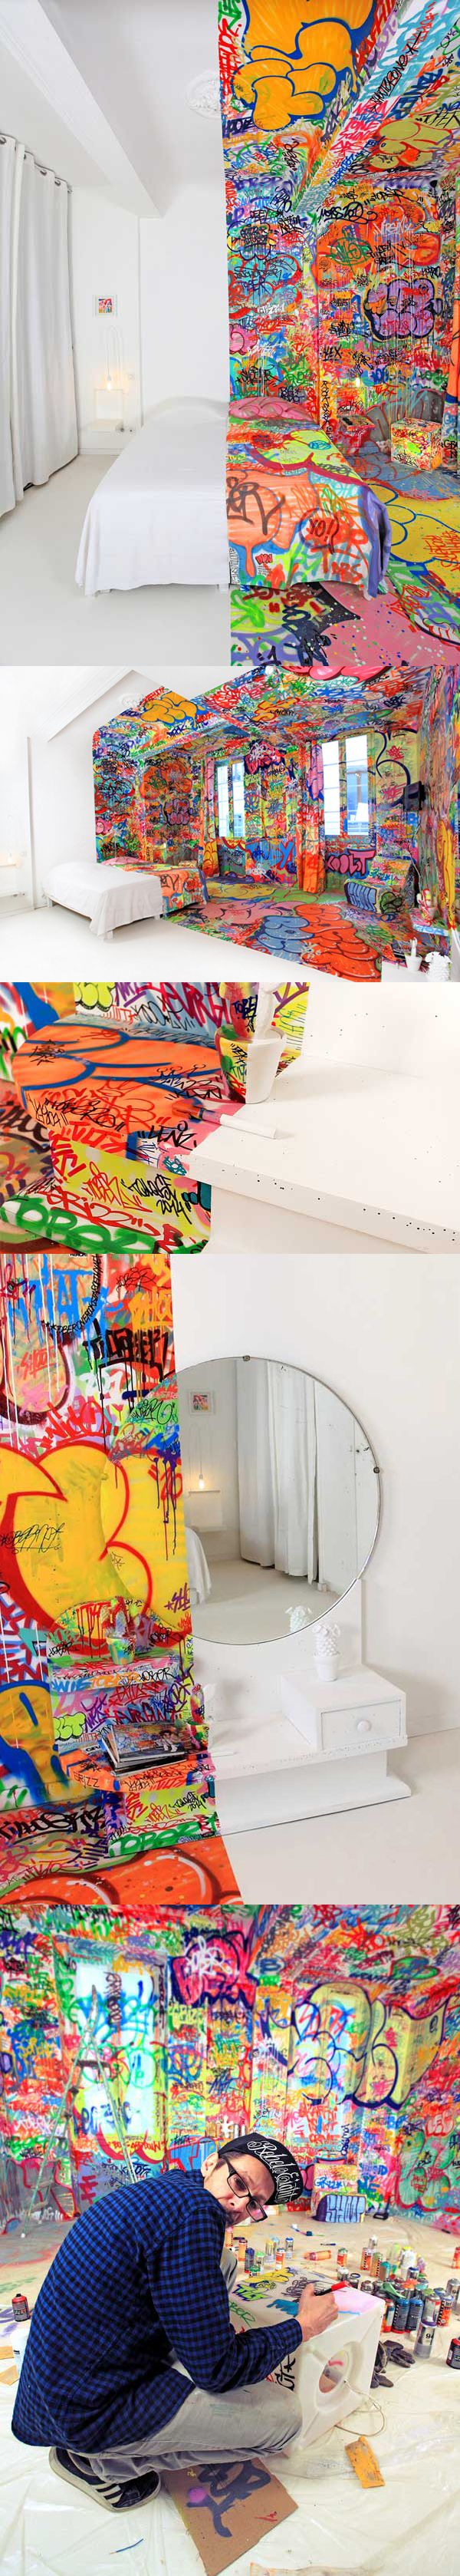 Urban Art Street Graffiti Home Decore Bedroom Bathroom Amazing Interior Design Unique Color Fun Innovative Daring Wild